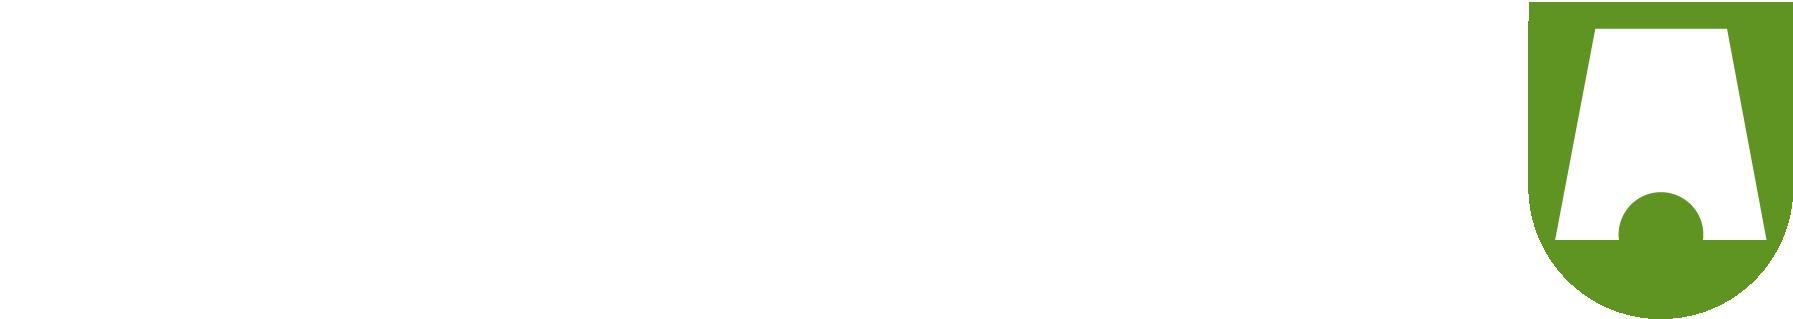 Grafisk Profil Profilhandbok Og Logoer Om Kommunen Baerum Kommune